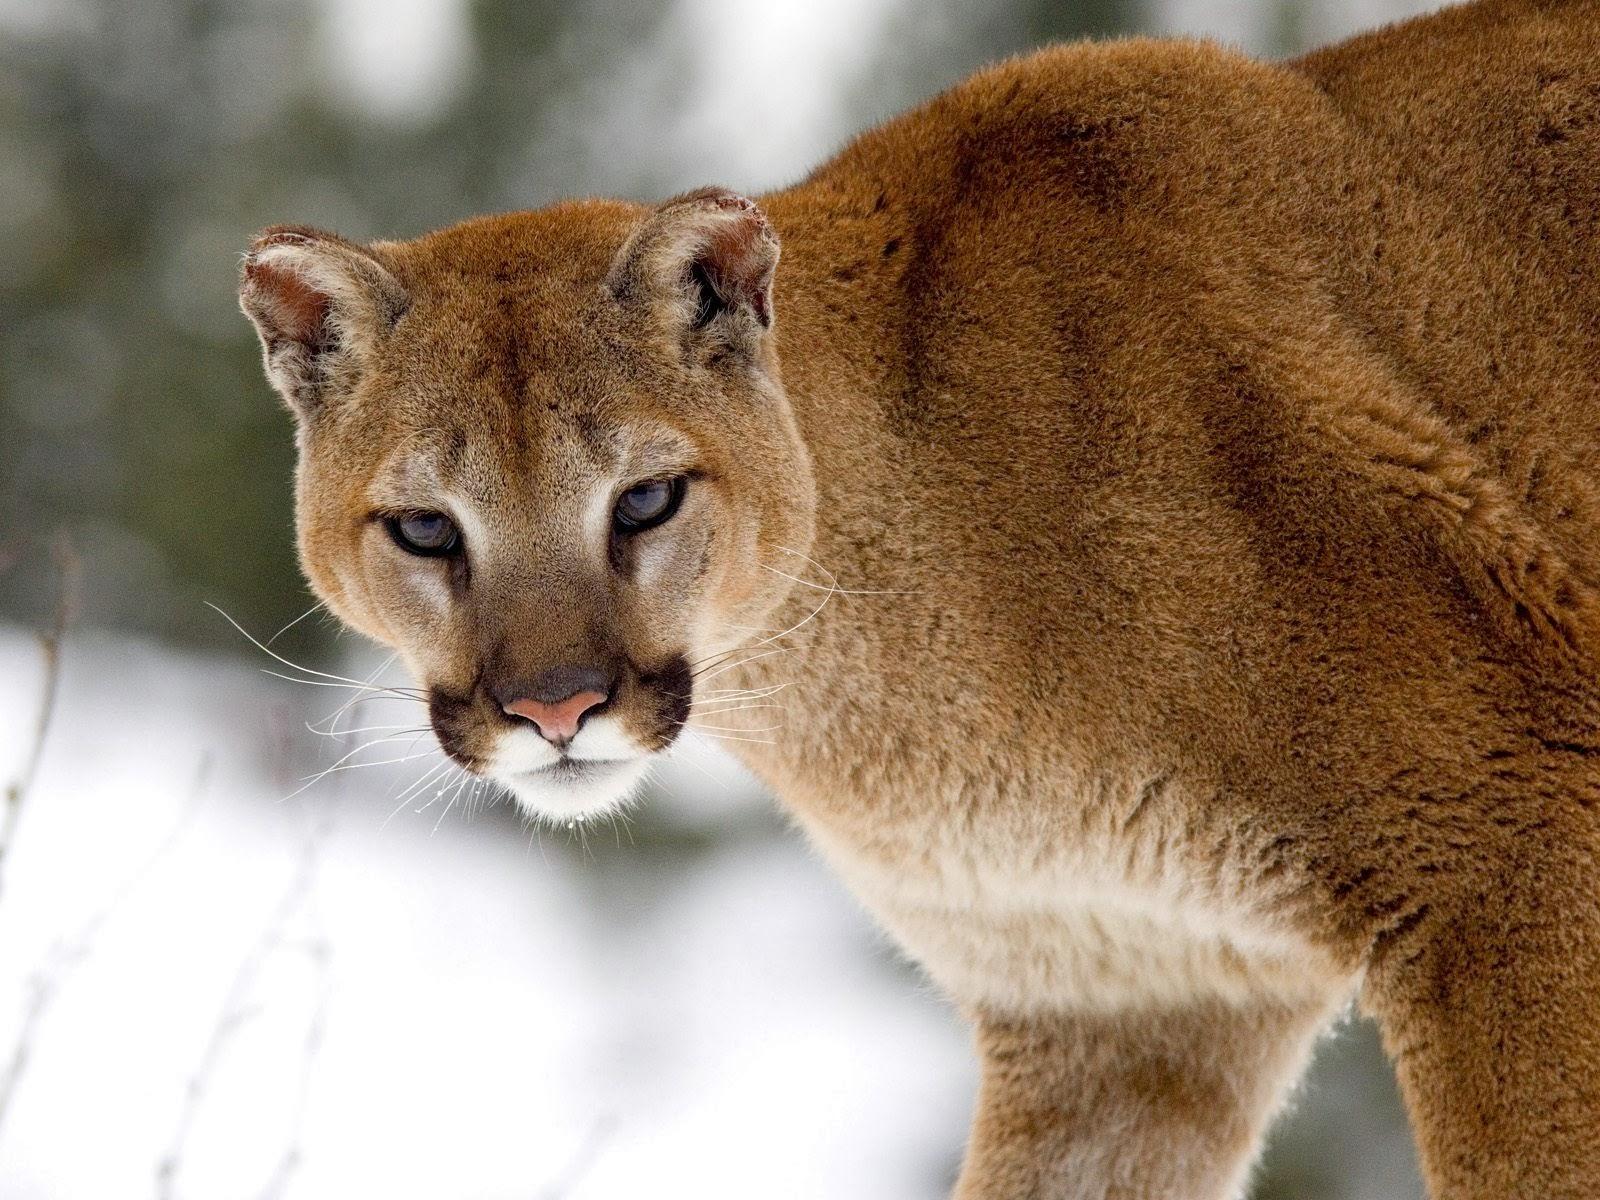 "<img src=""http://2.bp.blogspot.com/-SMKlDb-xfio/Ut5Fy486CqI/AAAAAAAAJhg/LdiExXvzmZo/s1600/cougar-in-winter.jpg"" alt=""cougar in winter"" />"